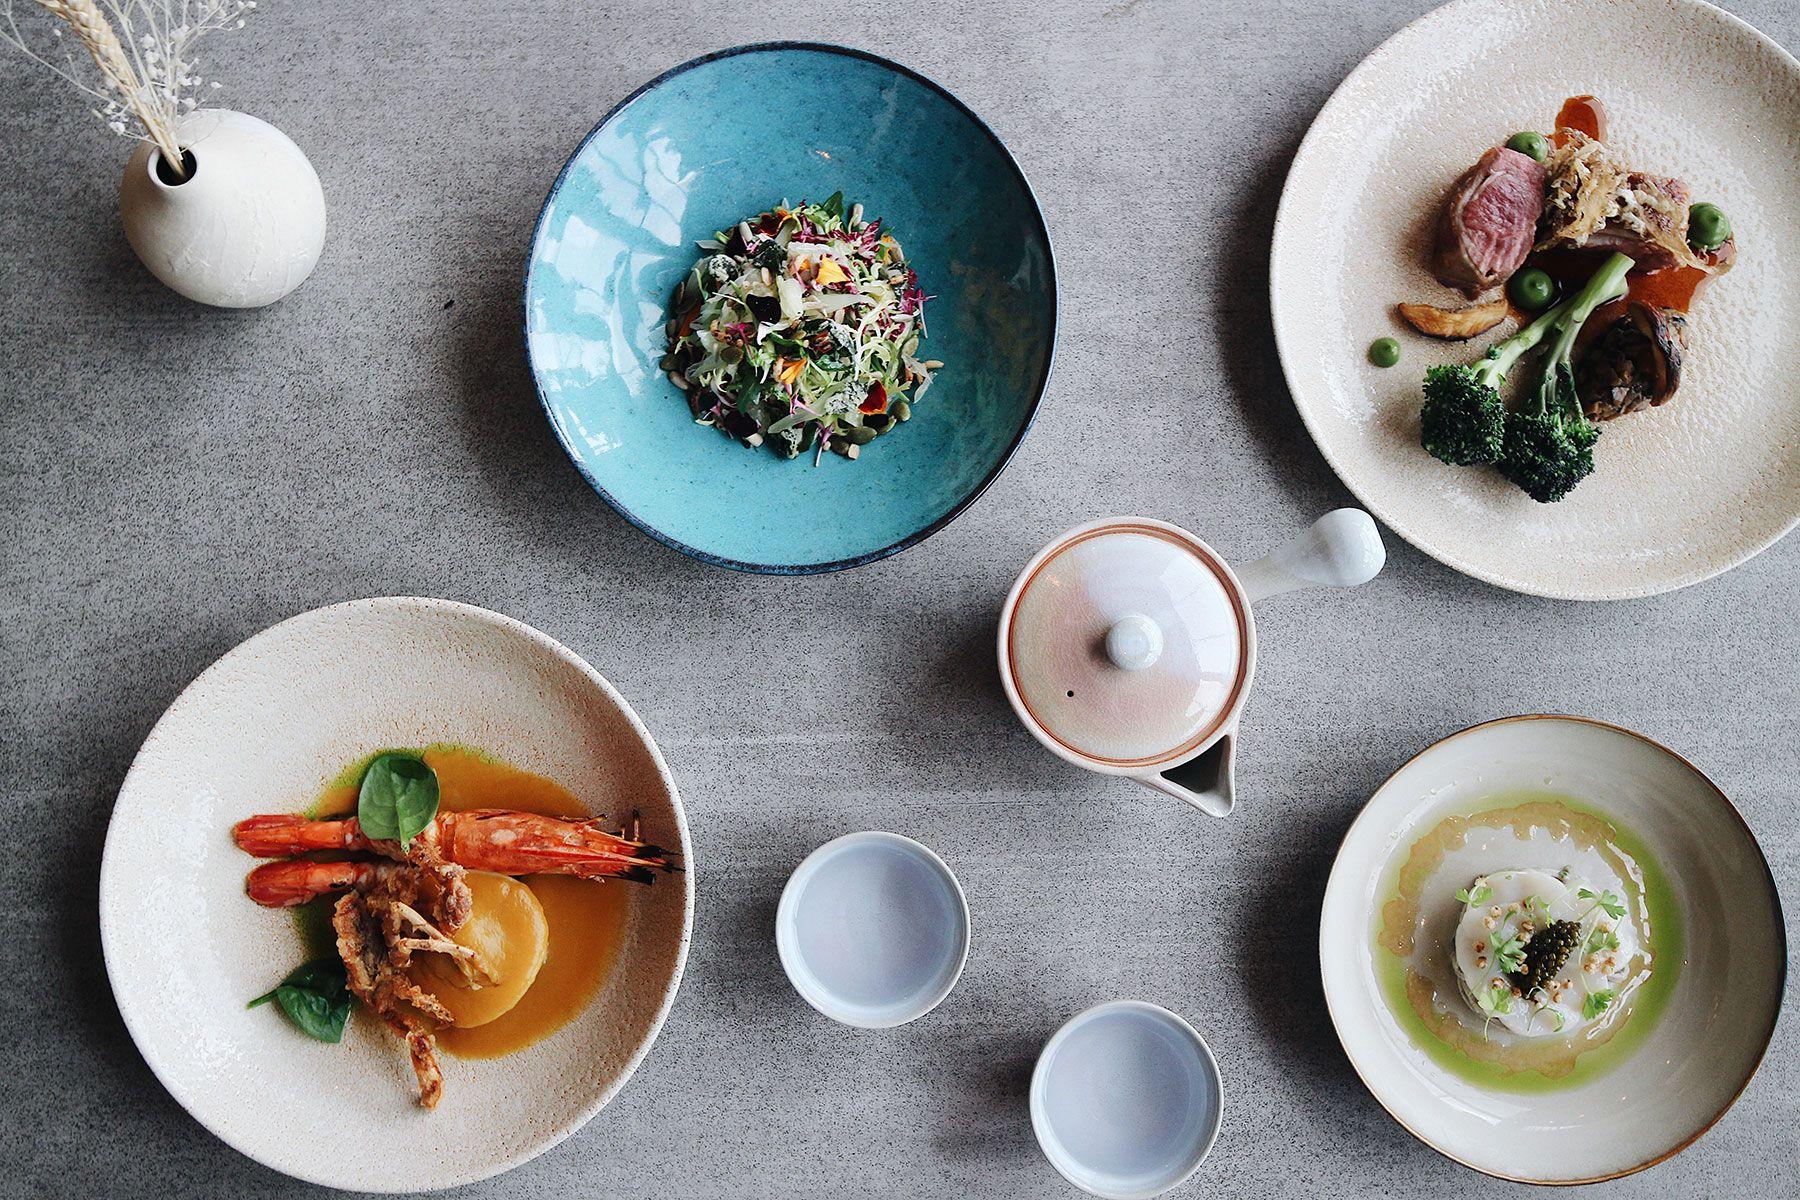 Where To Eat This Week: Skai, Blue Lotus, Salt Grill & Sky Bar, Manhattan, Astor Bar